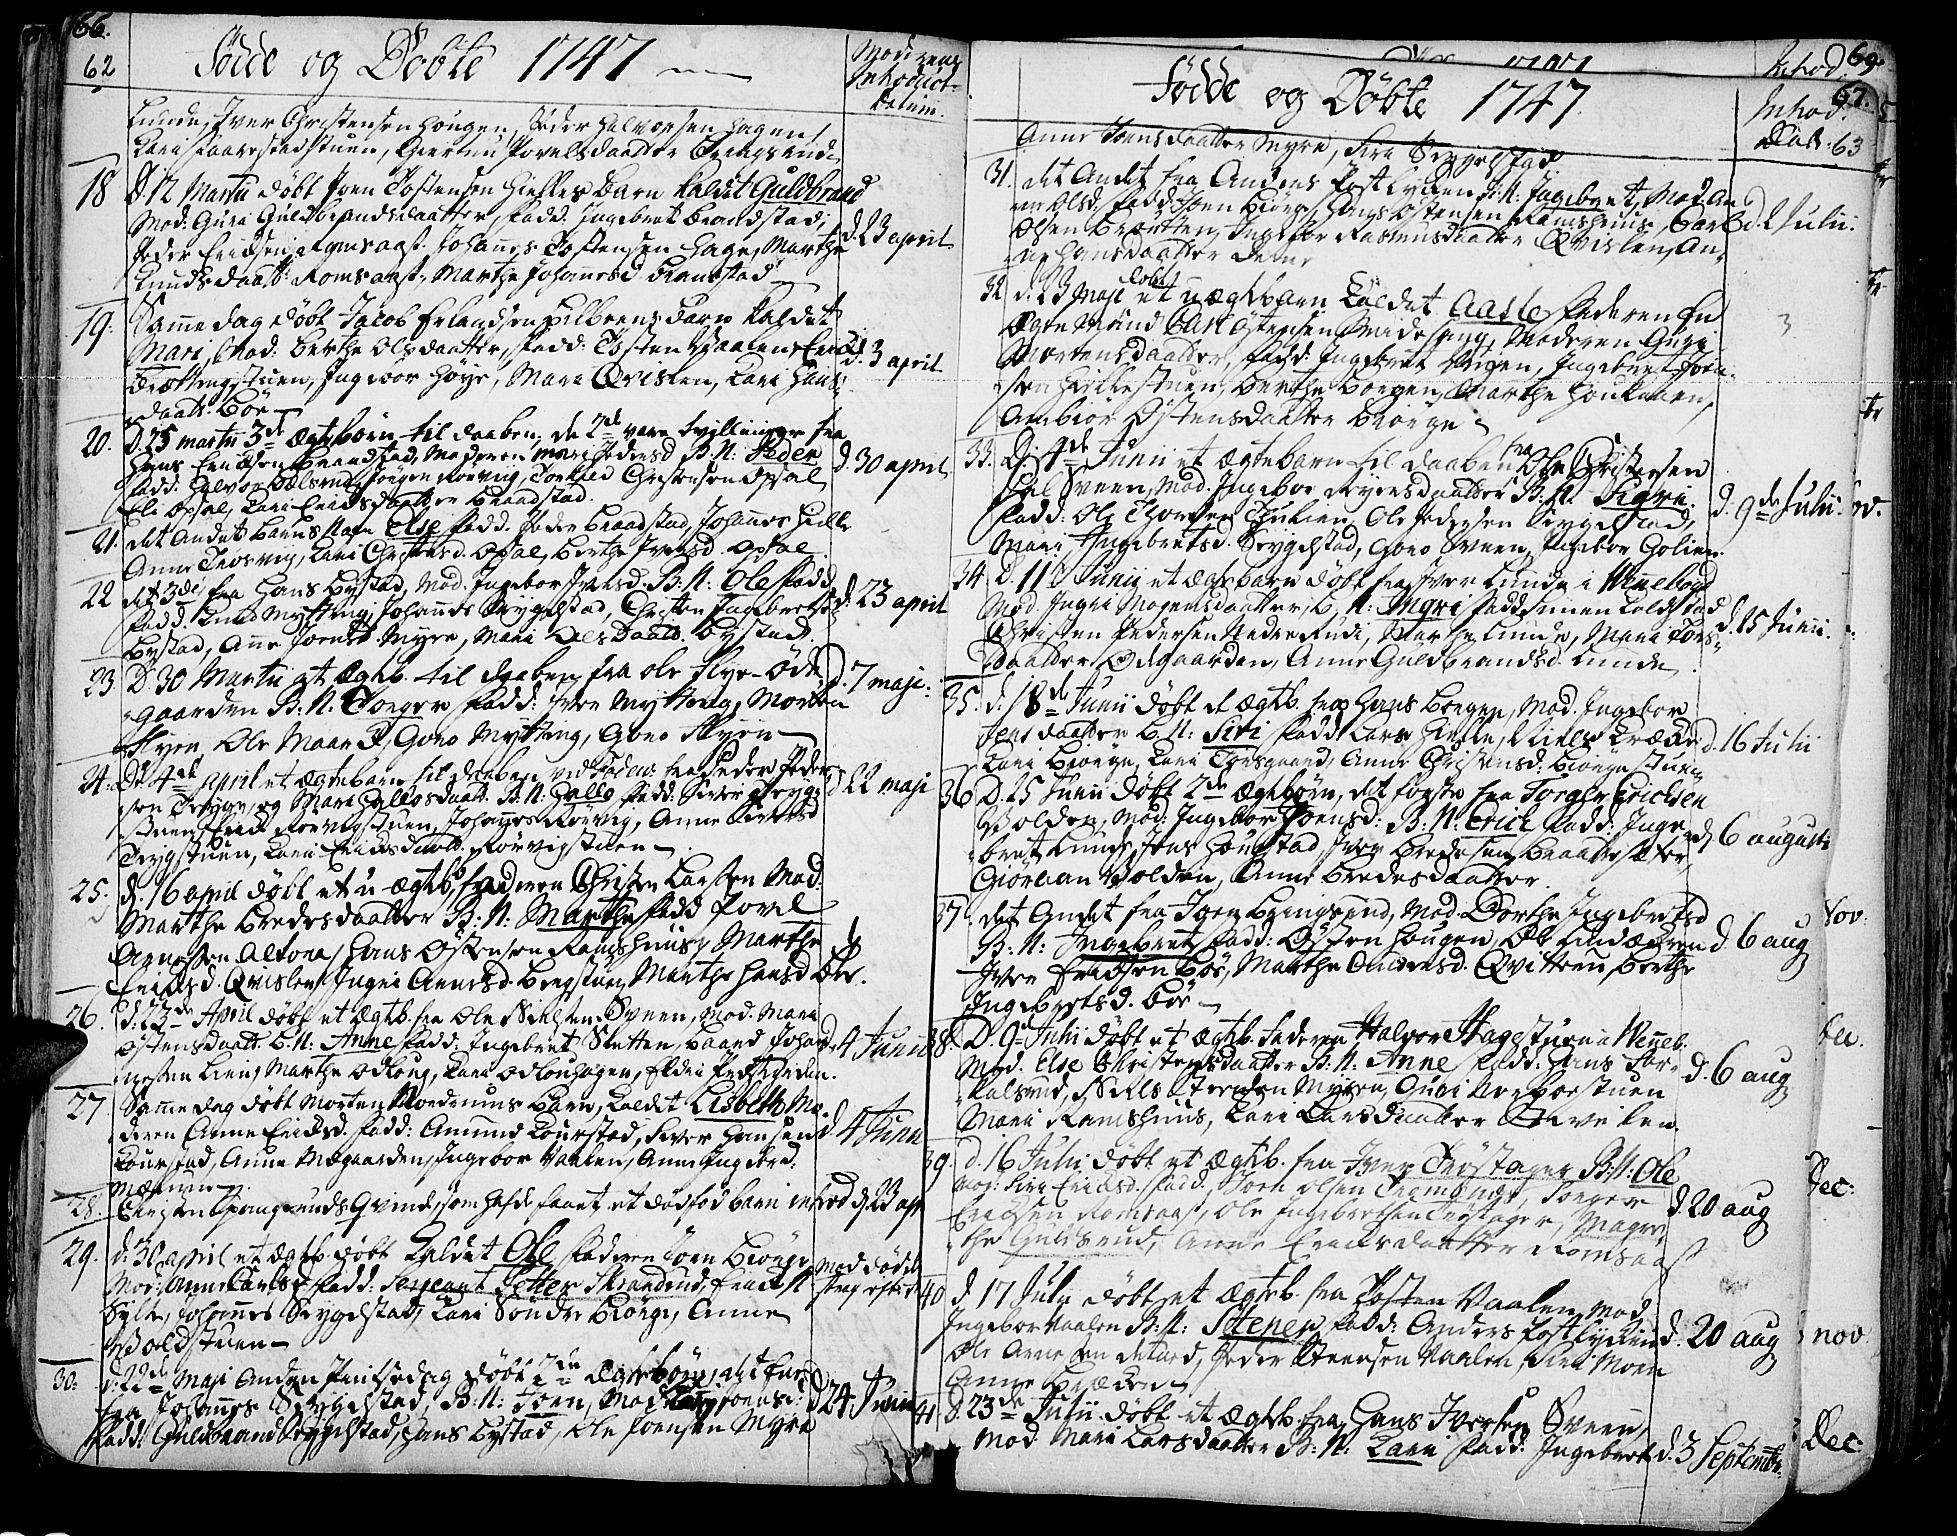 SAH, Ringebu prestekontor, Ministerialbok nr. 2, 1734-1780, s. 62-63